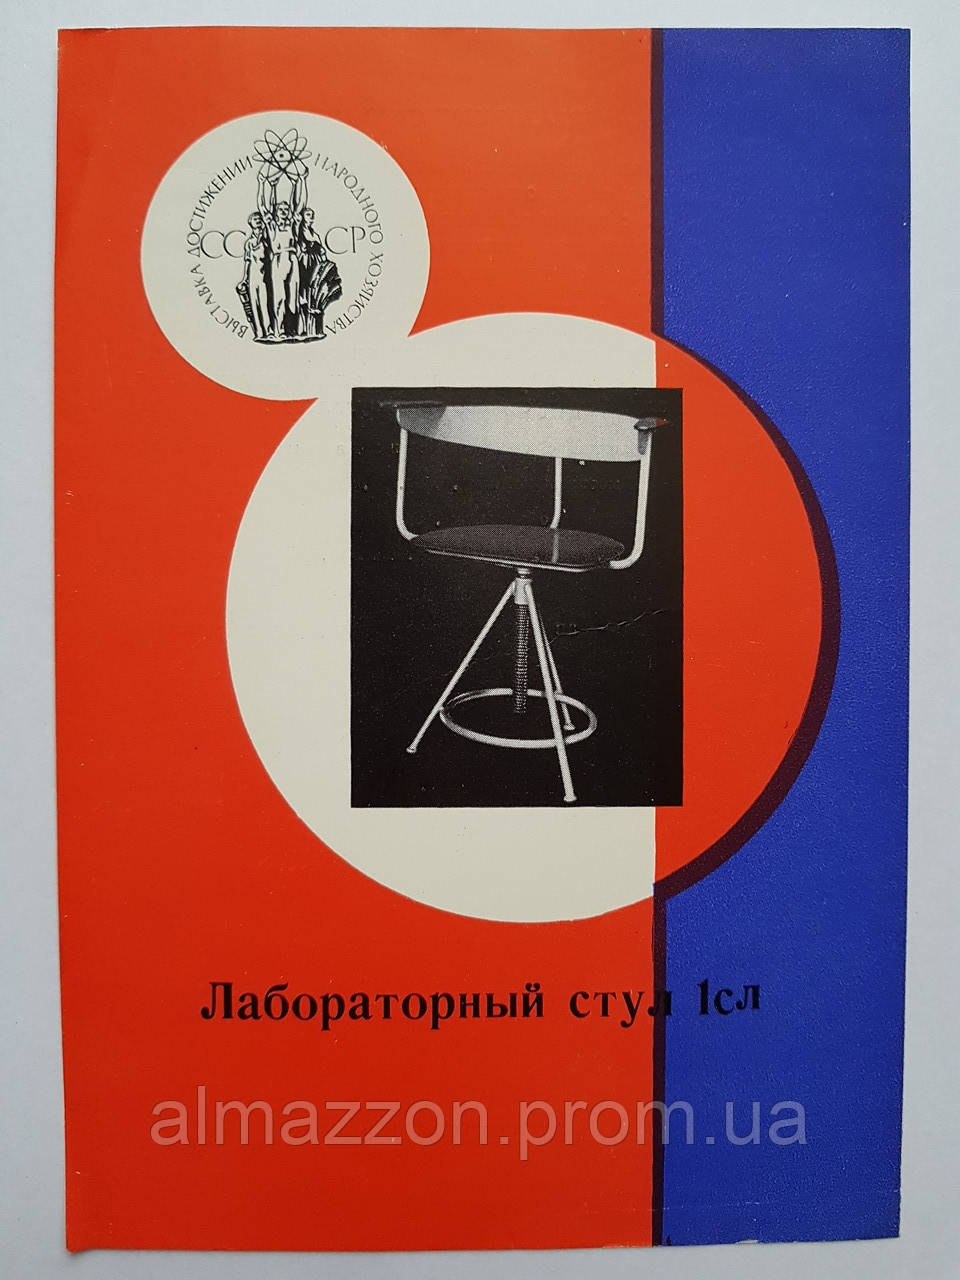 Реклама ВДНХ Лабораторный стул 1СЛ.